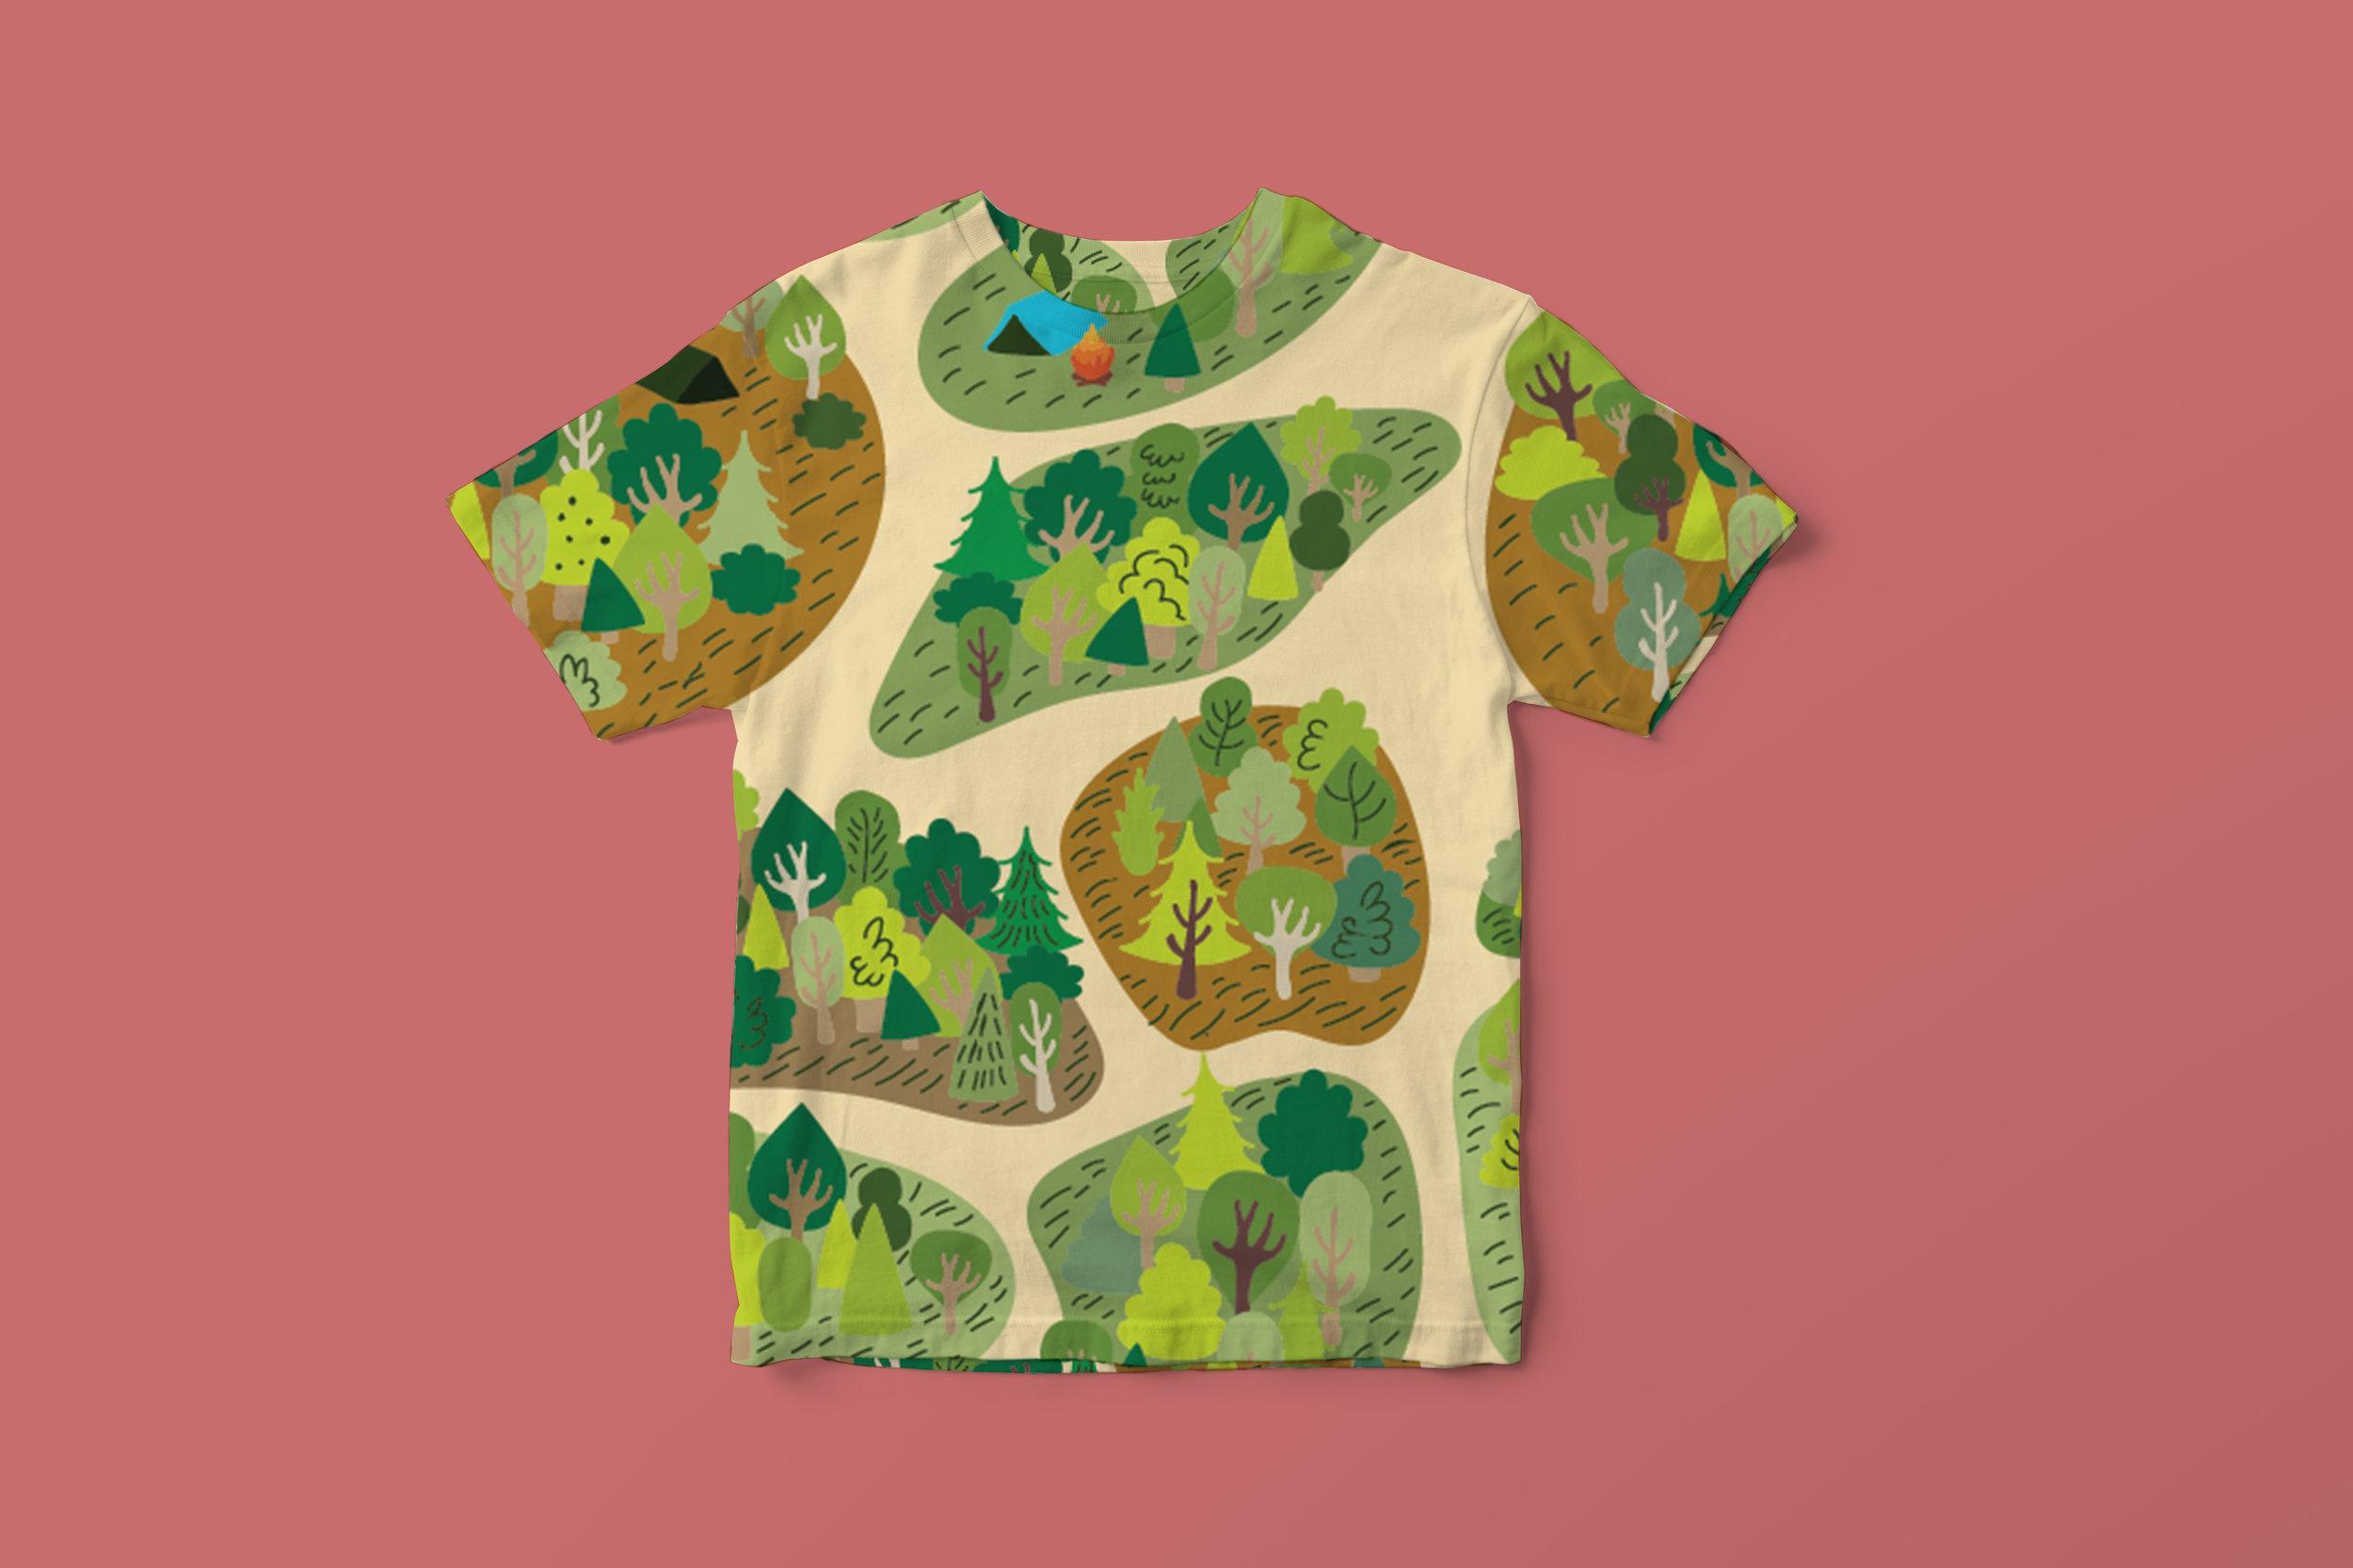 kid's t-shirt concept design